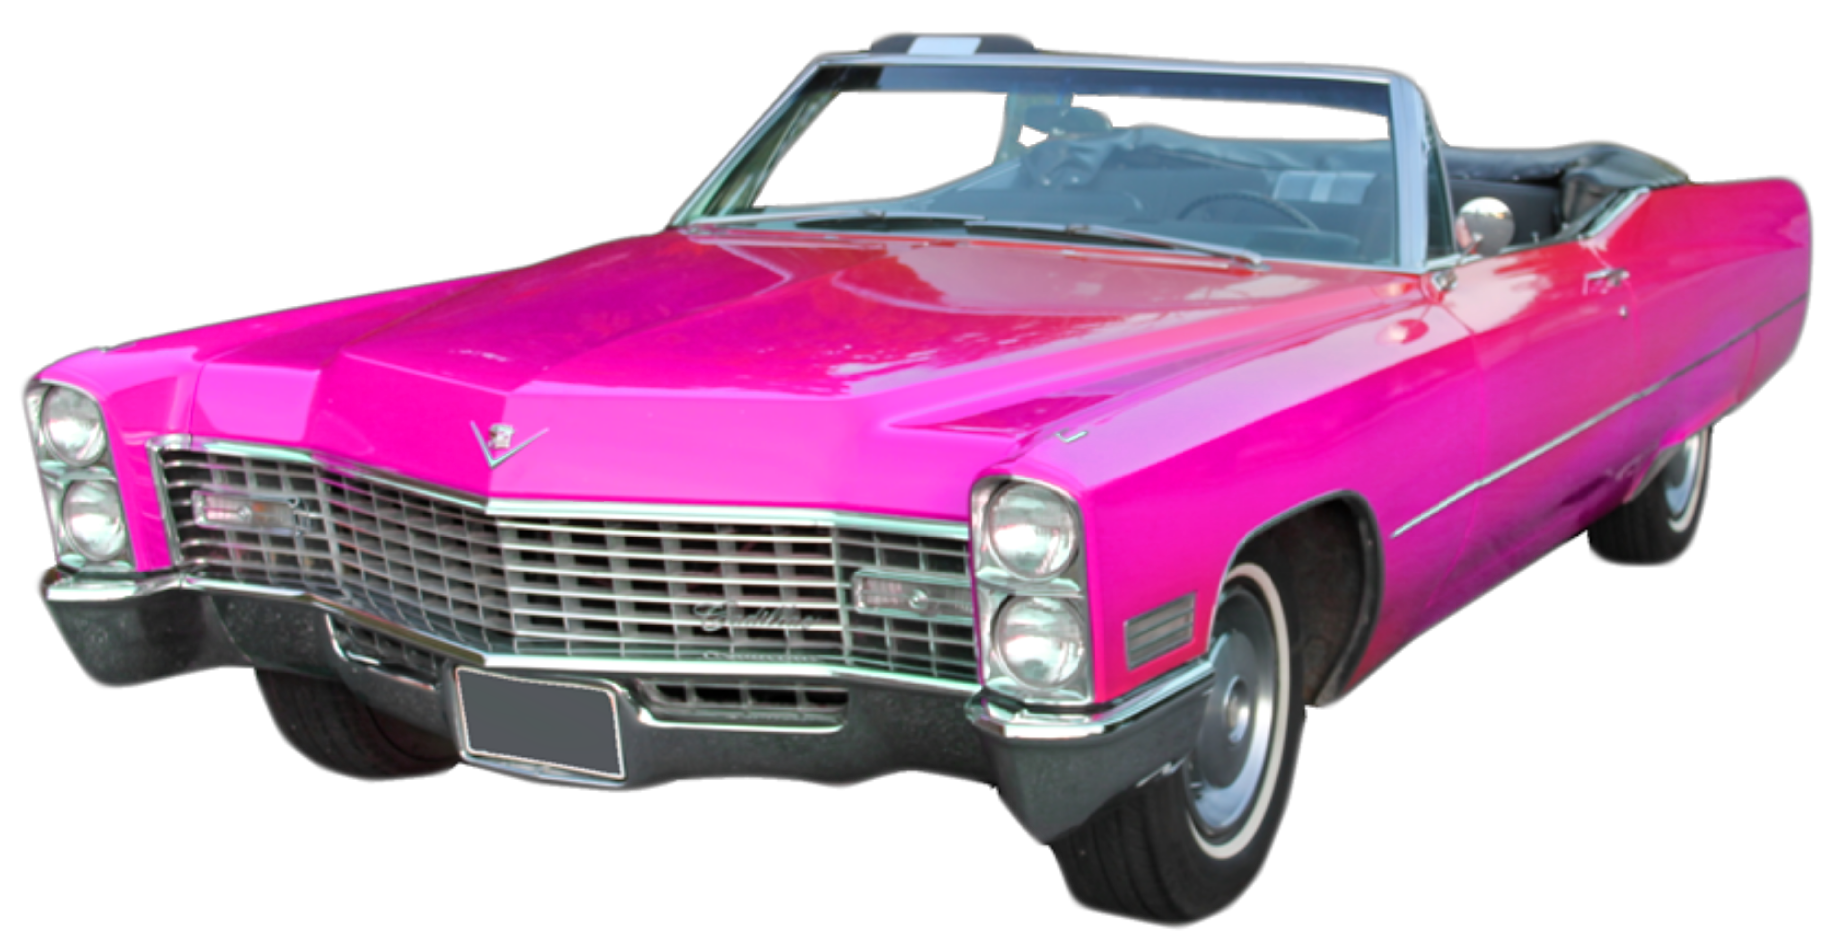 Cadilac car clipart png freeuse library ftestickers car convertible cadillac pinkcadillac retr... png freeuse library